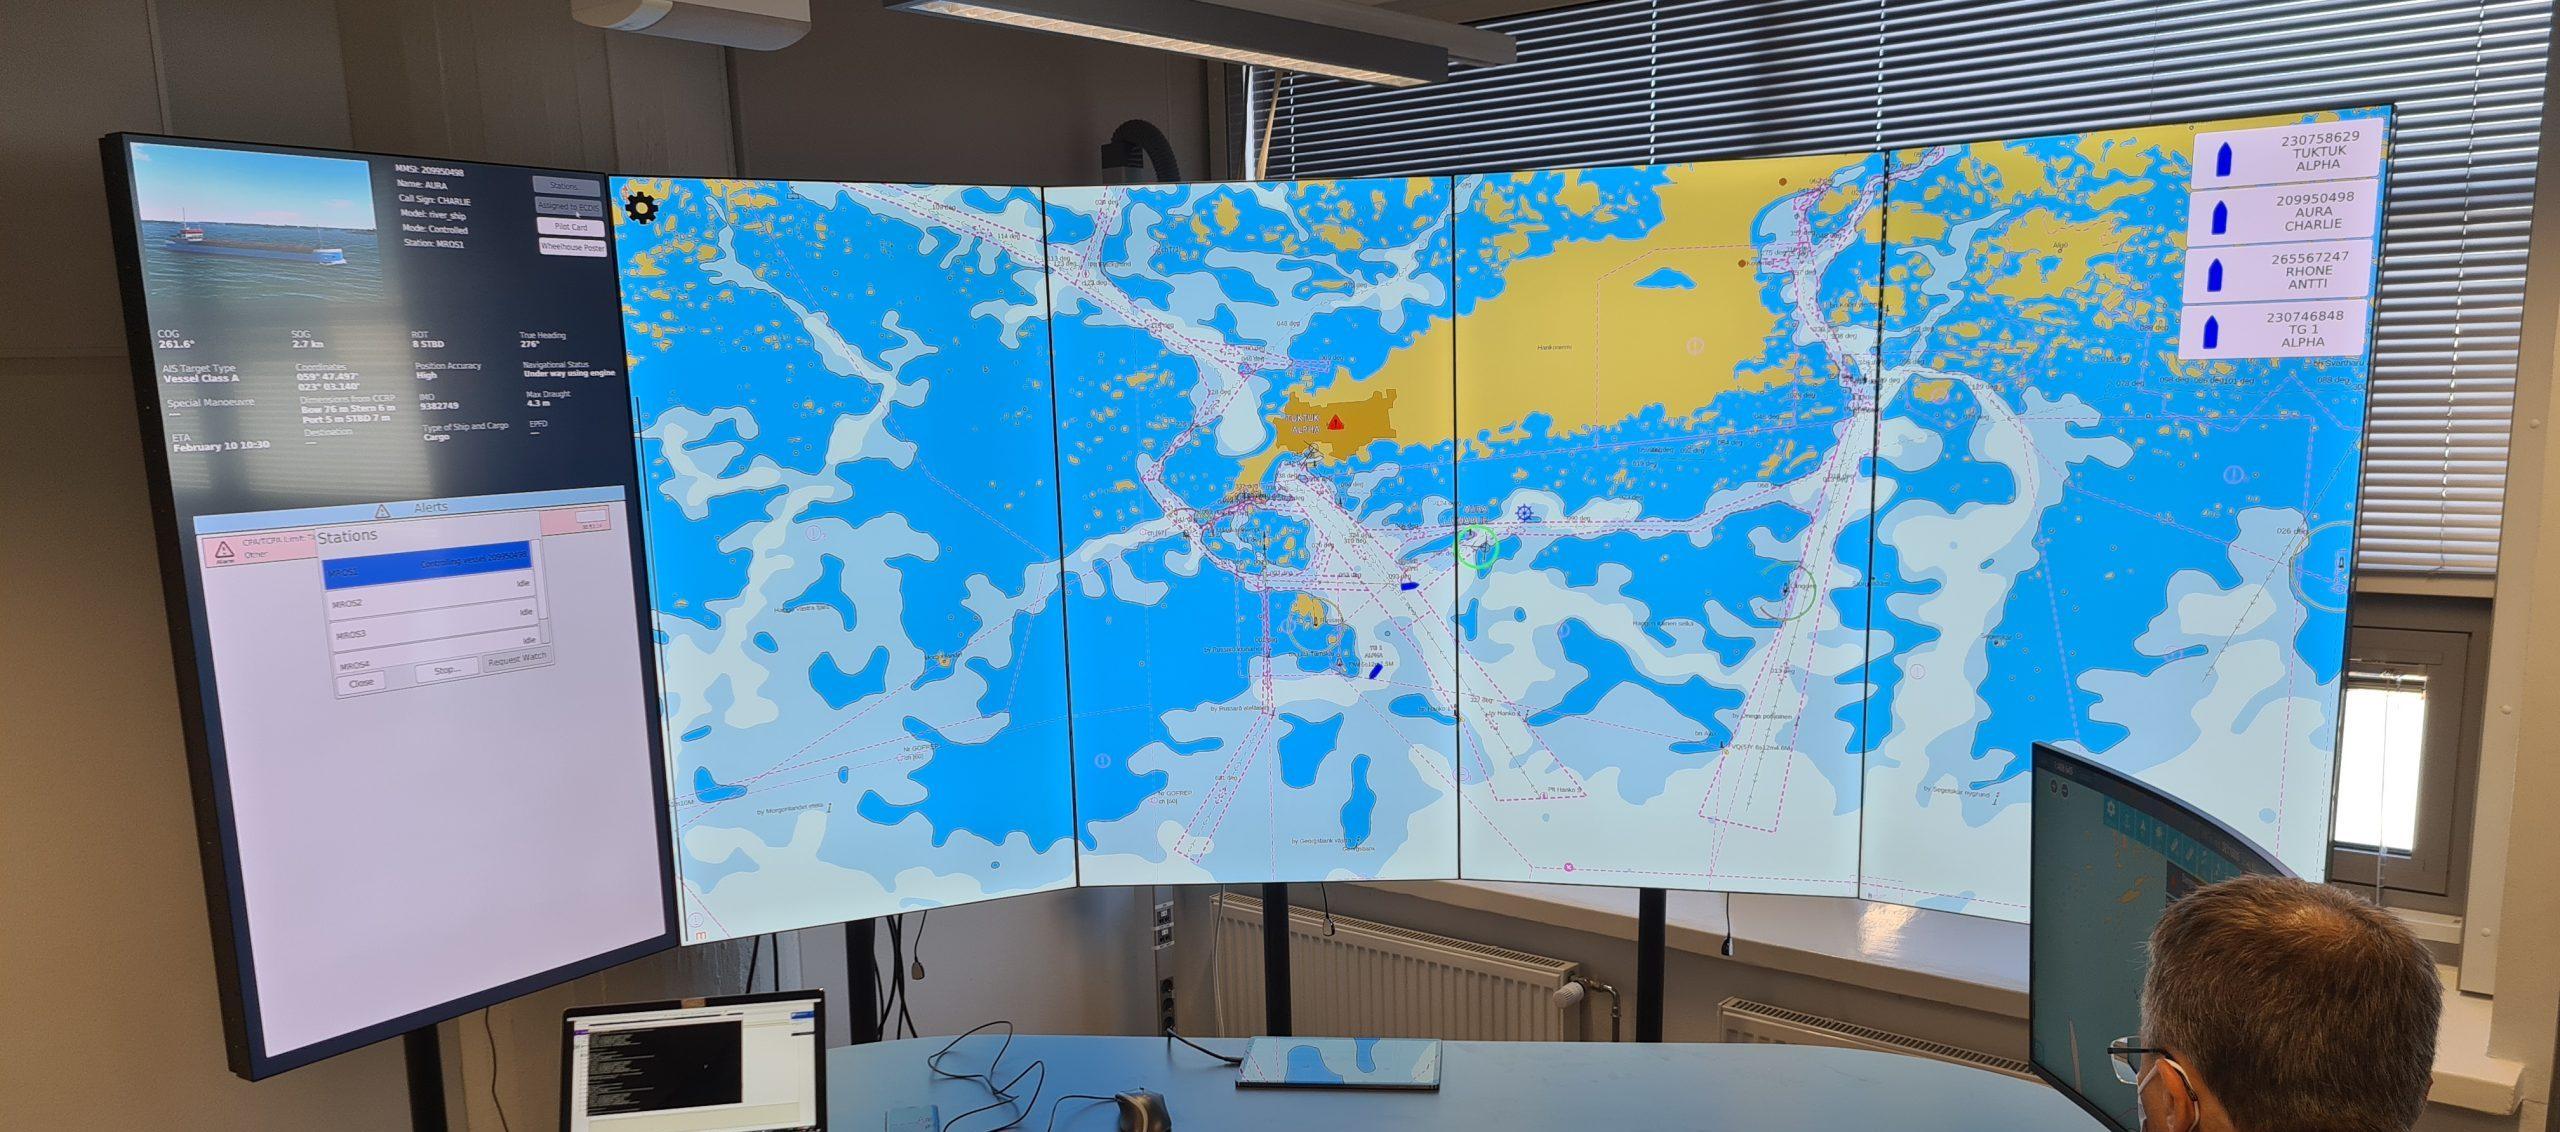 Aboa Mare Autonomous Vessel Remote Operations Center (AMROC) has been released